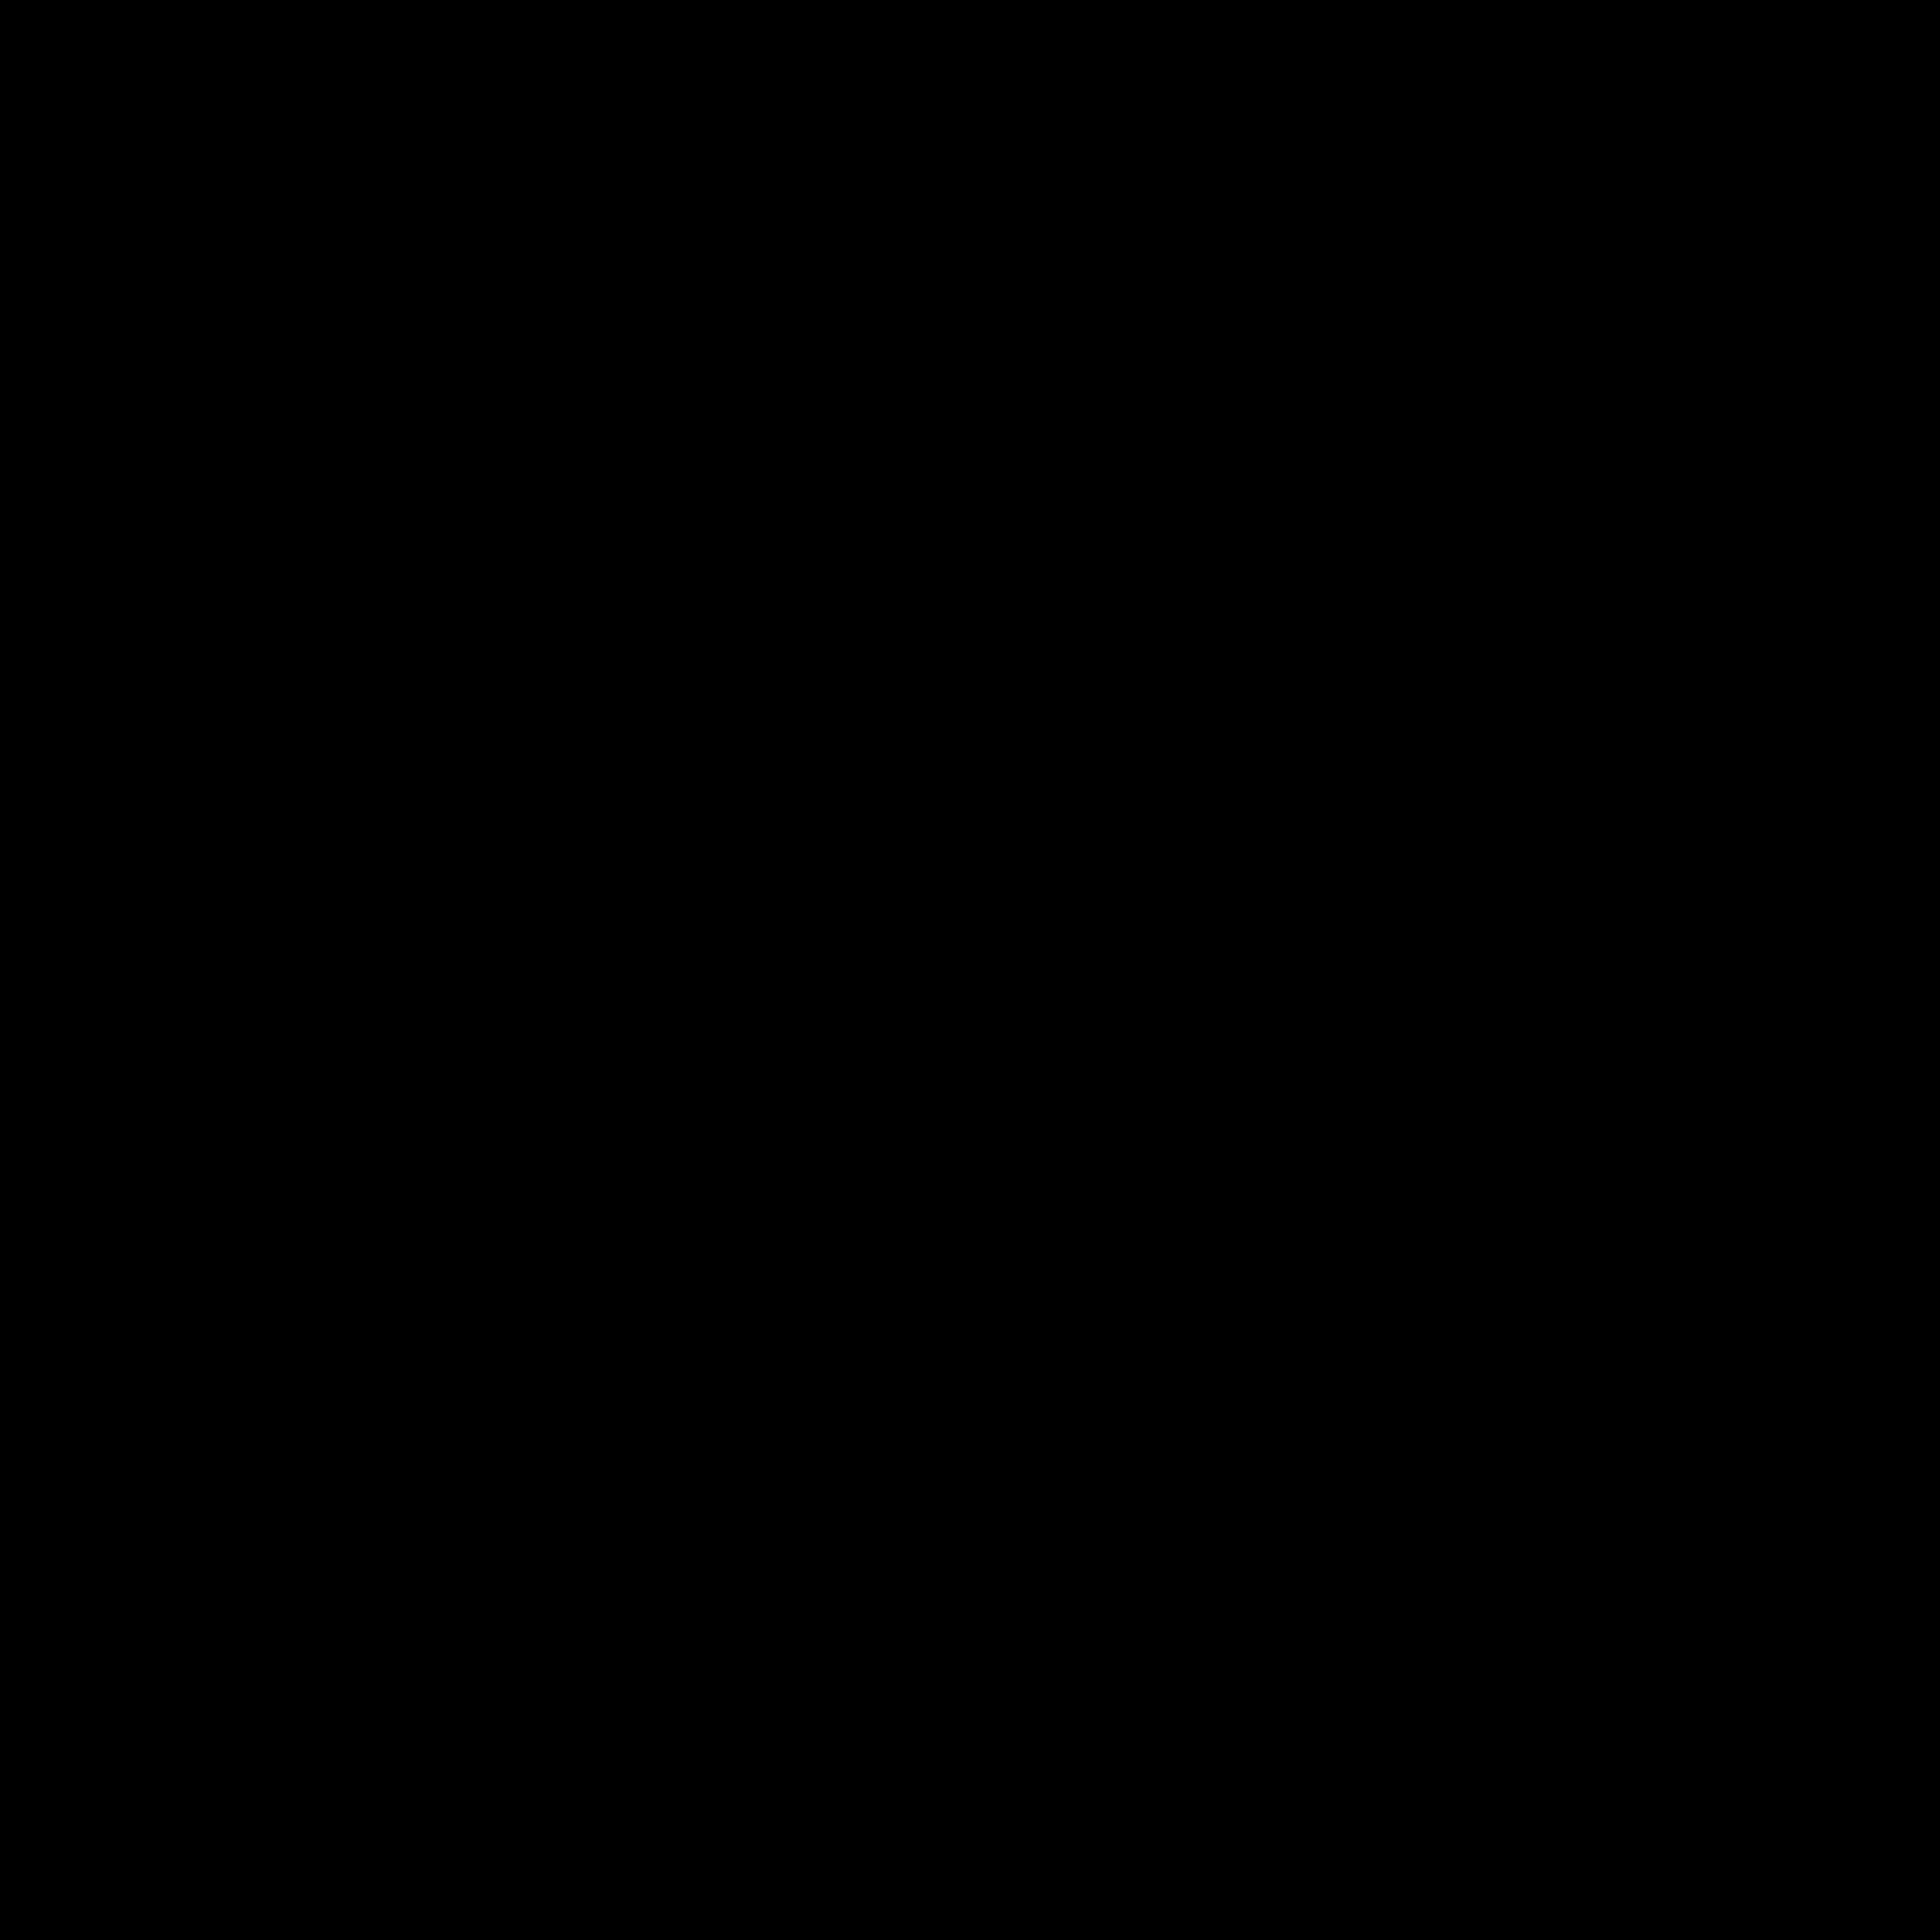 t rowe price logo 0 - T. Rowe Price Logo